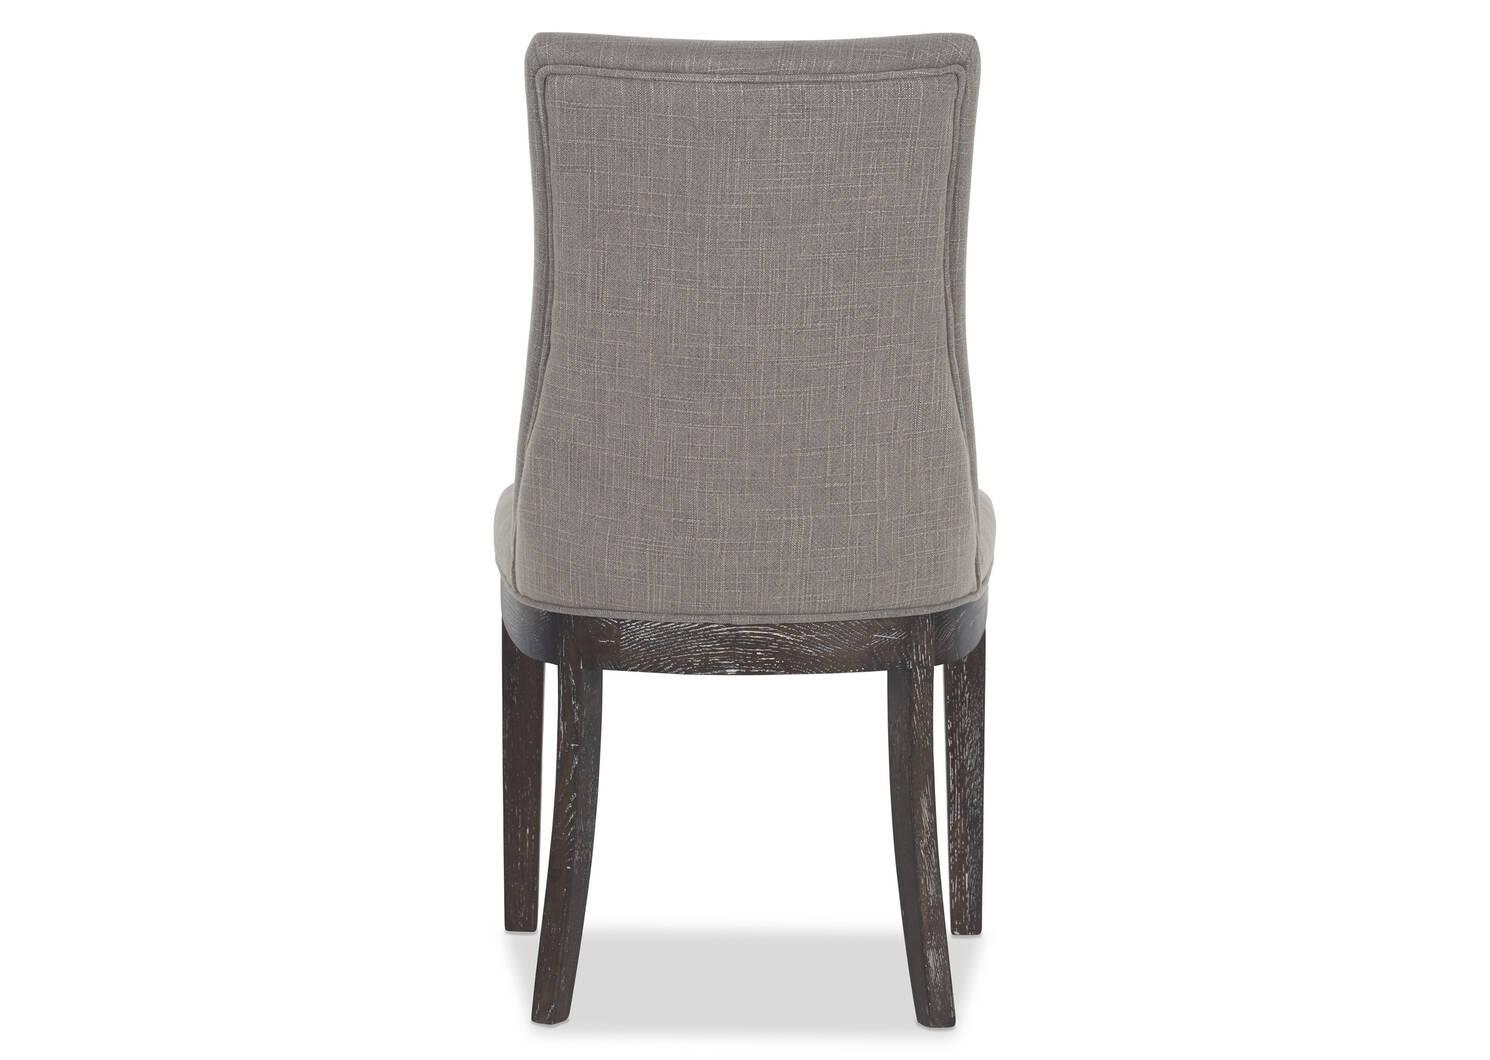 Georgia Dining Chair -Nantucket Grey